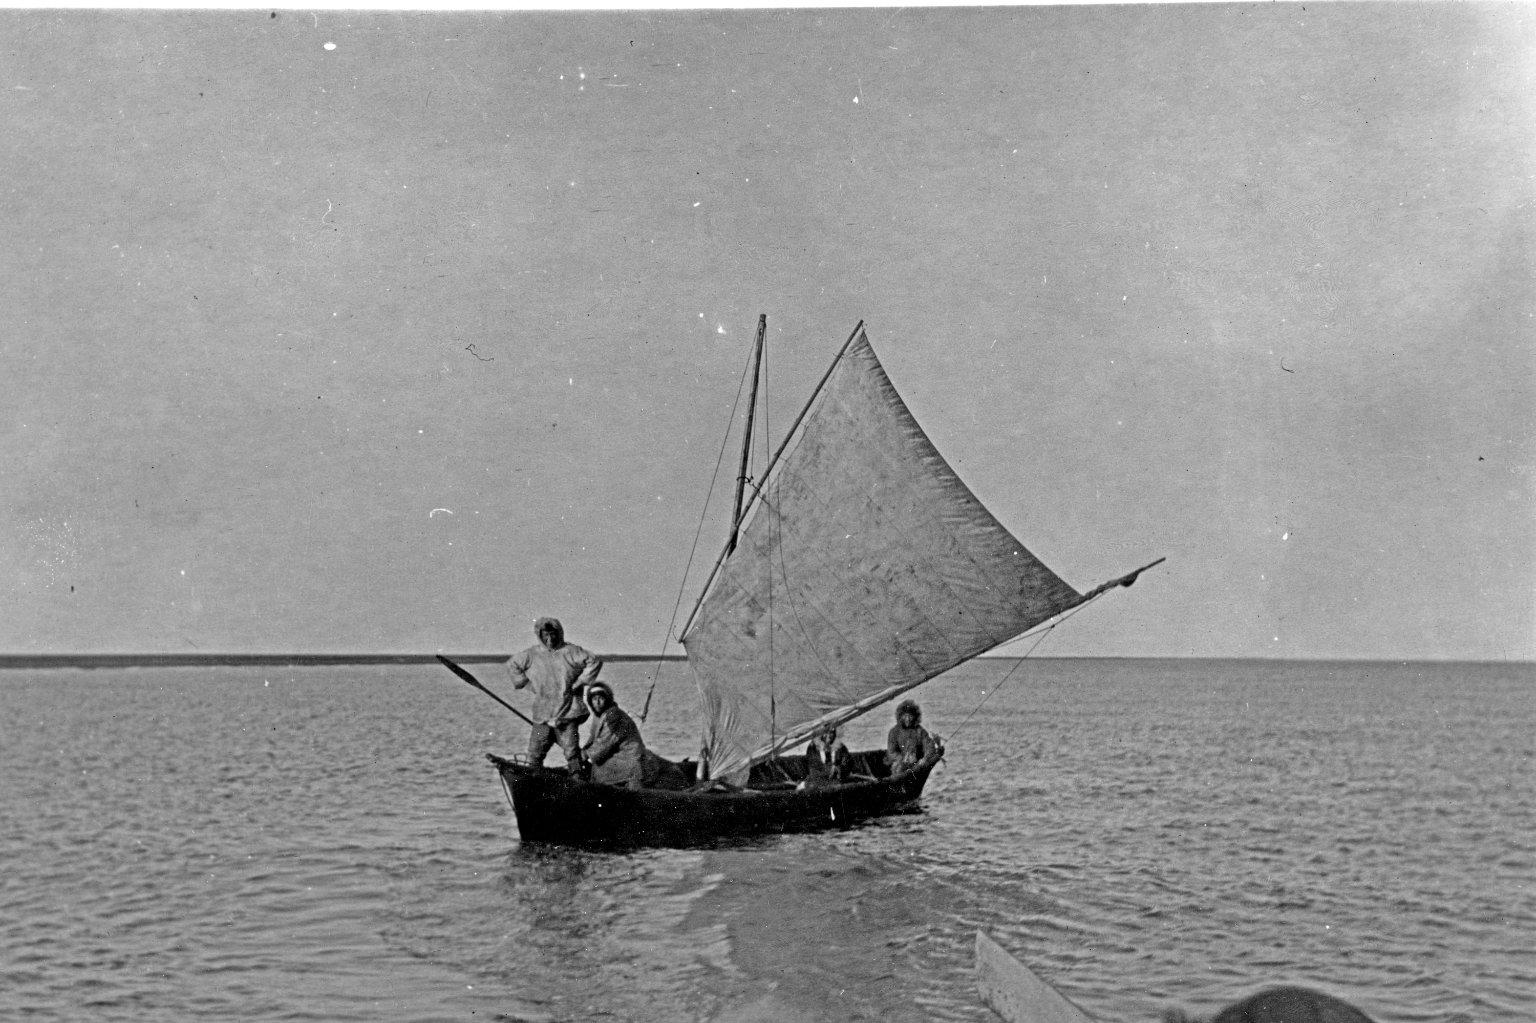 Oomiak under sail